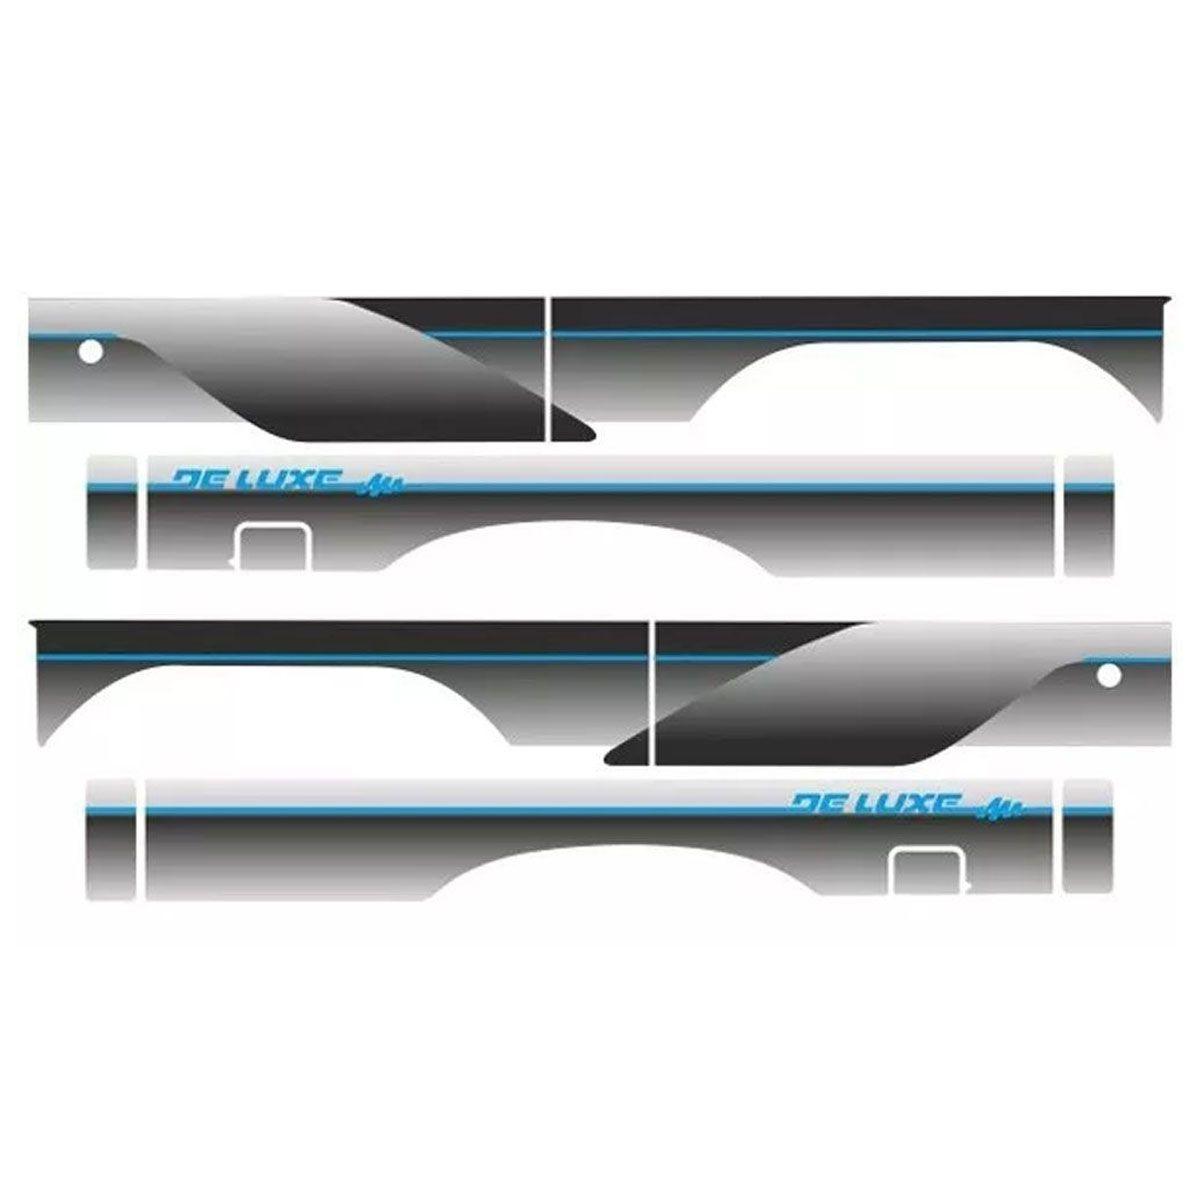 Conjunto Faixa Adesiva Prata Com Azul D20 Cabine Simples